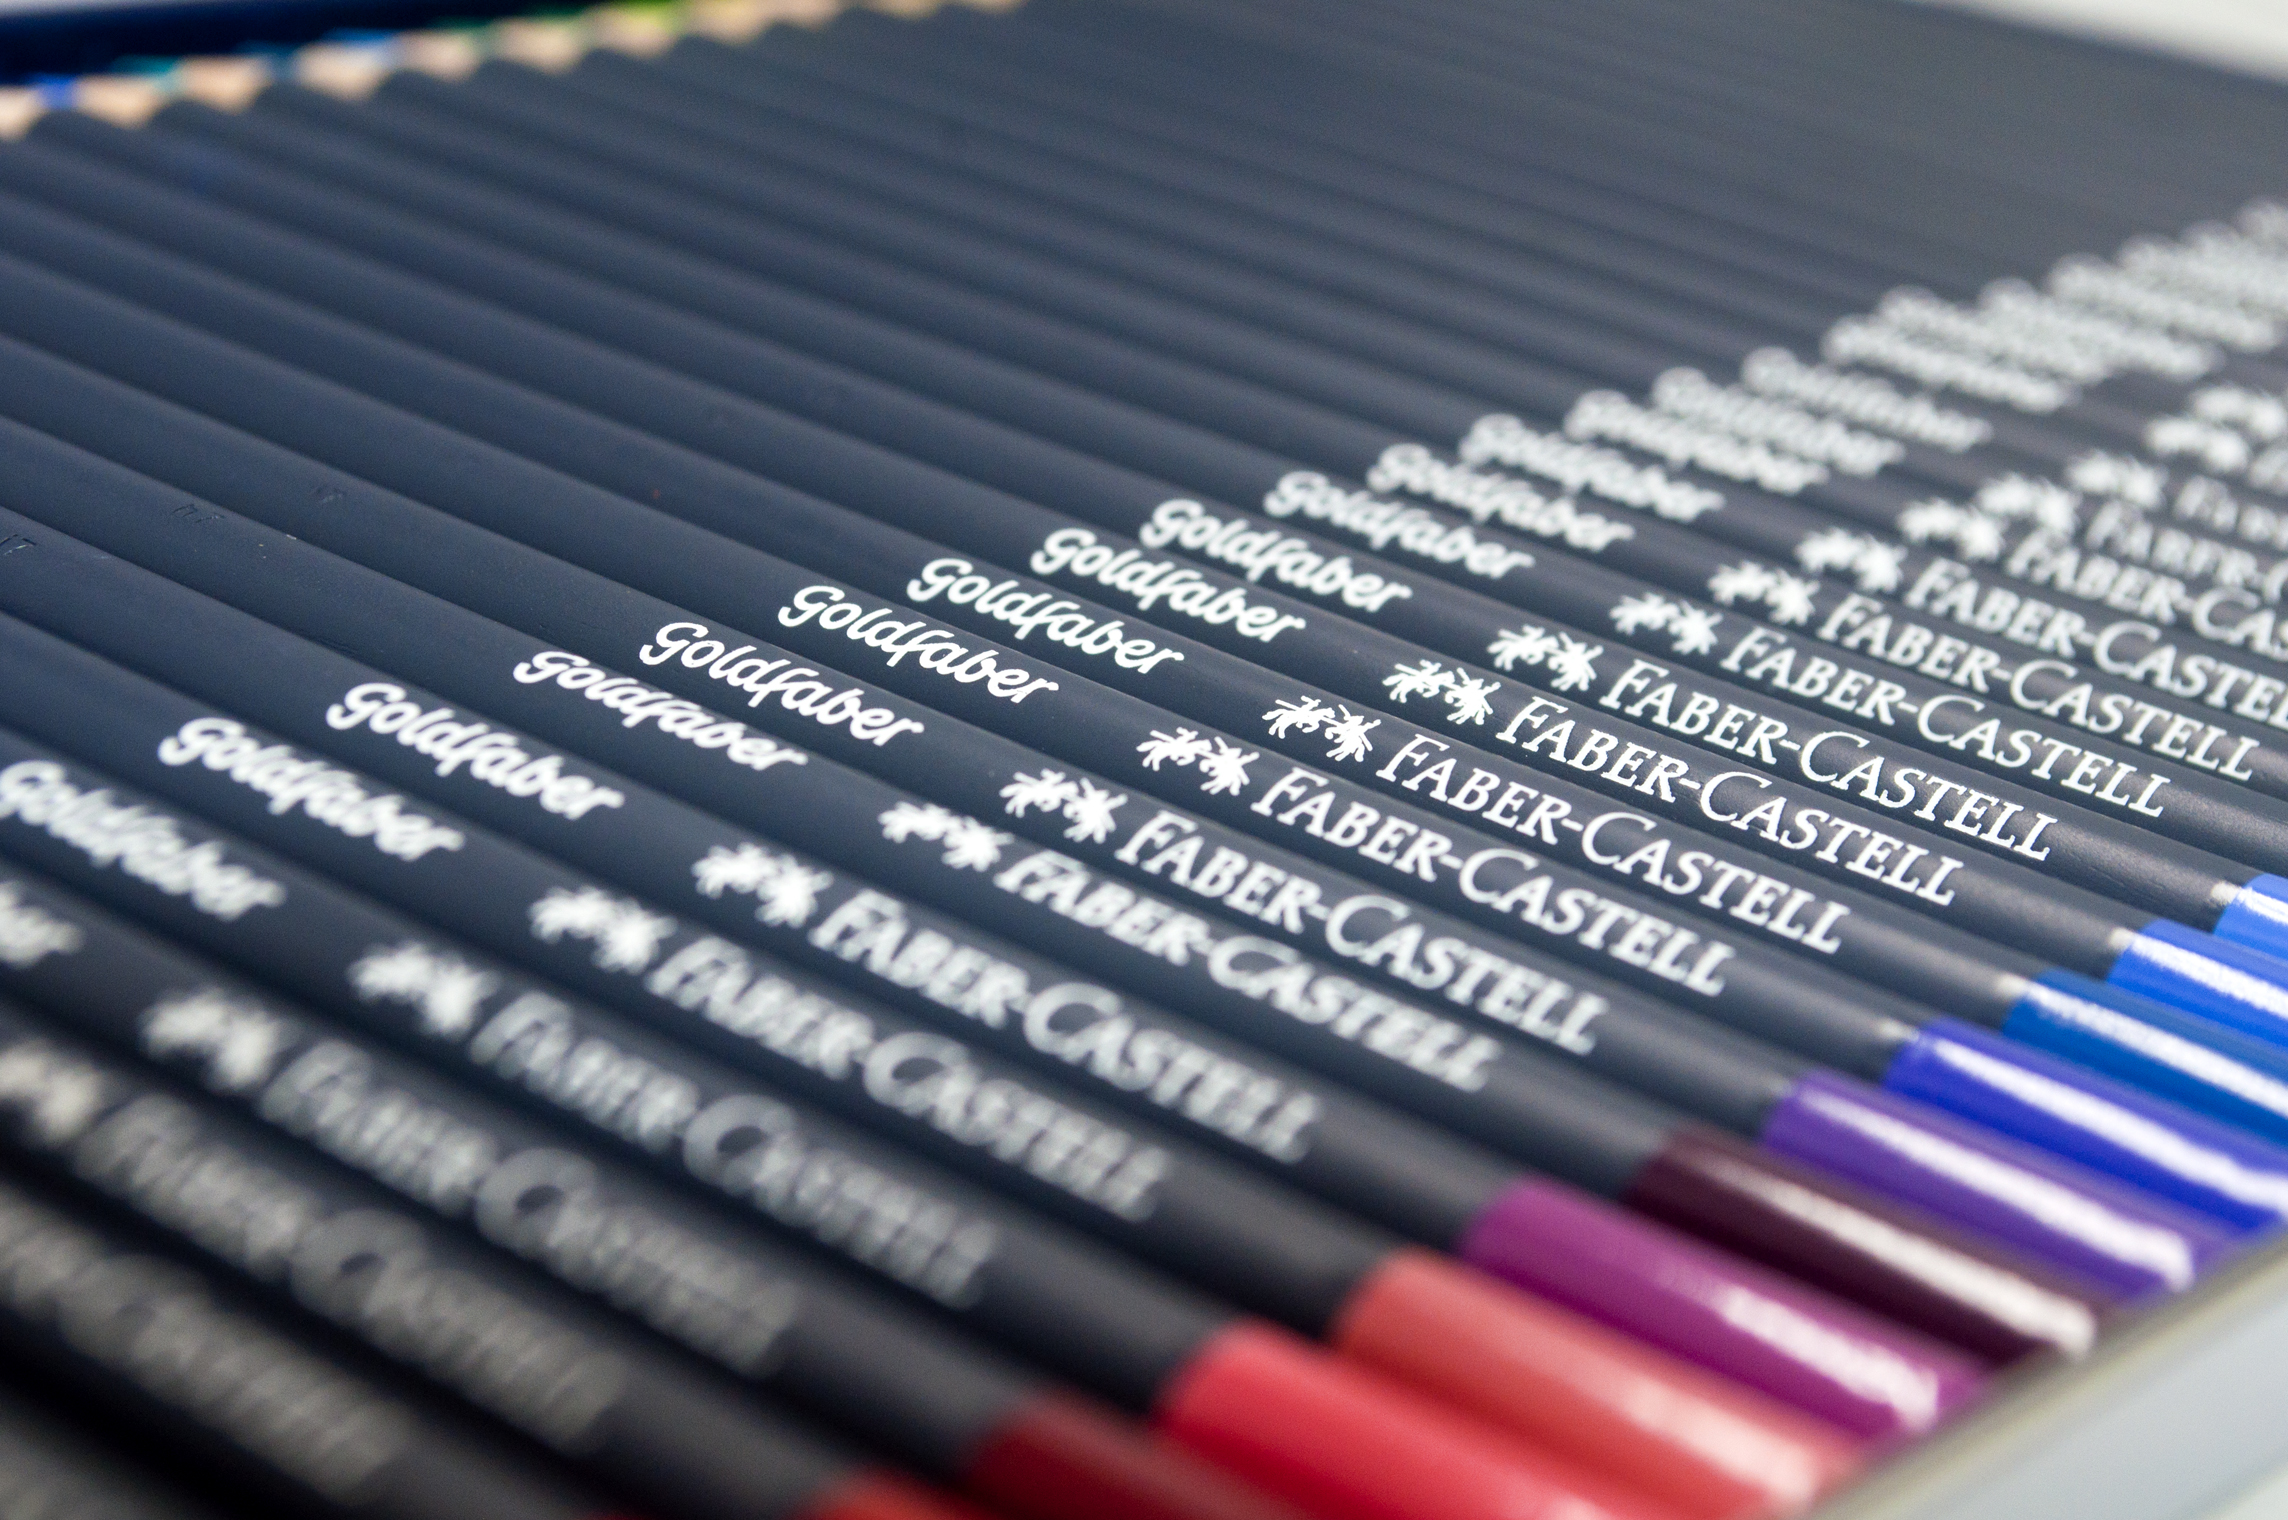 Goldfaber Pencils.jpg